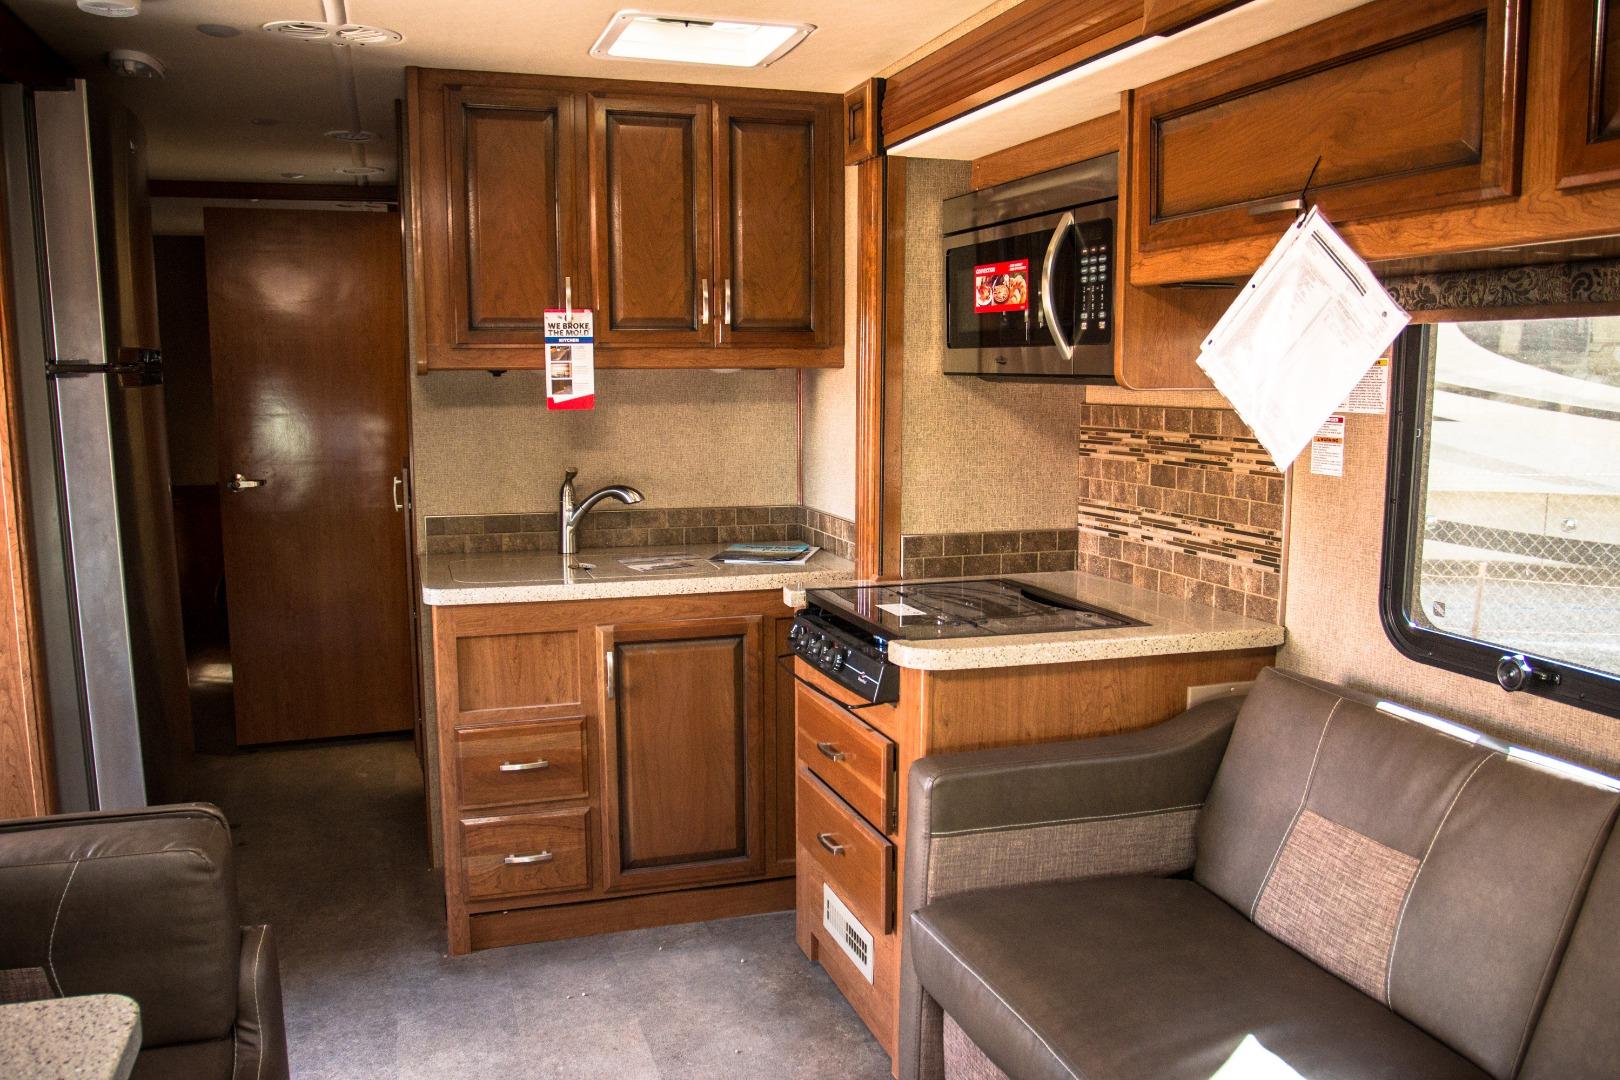 Home Sauna Kits Since 1974 https://newatlas/frigate-future-us-navy/58117/ 2019-08-16